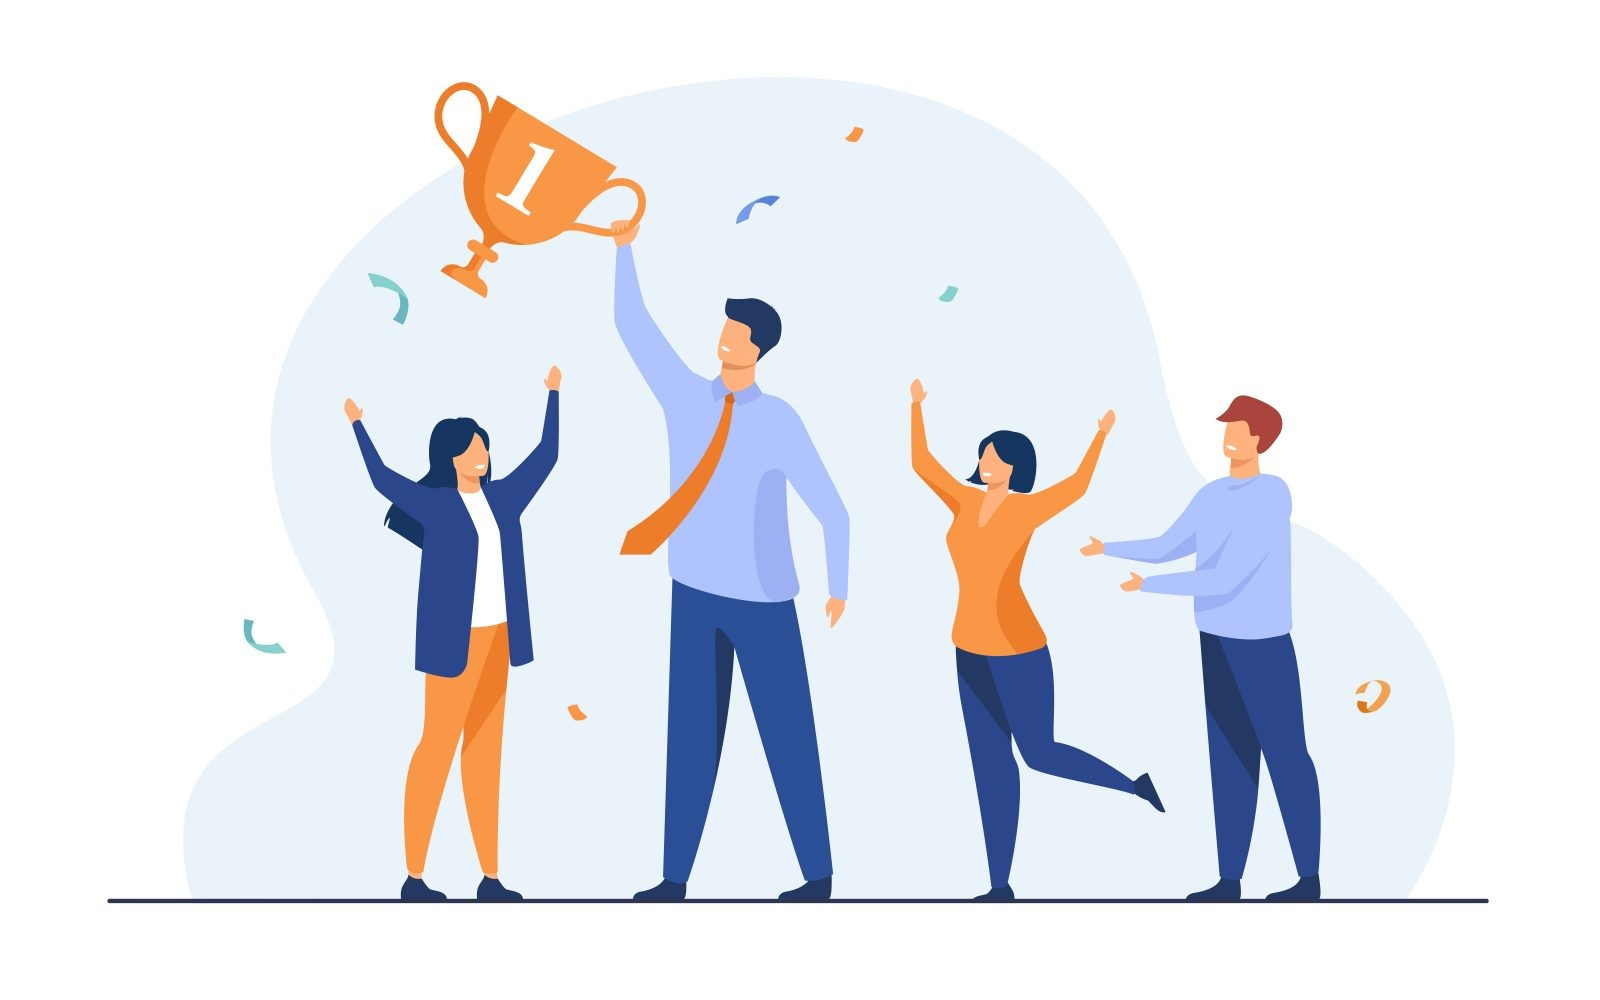 Teamwork and team success concept